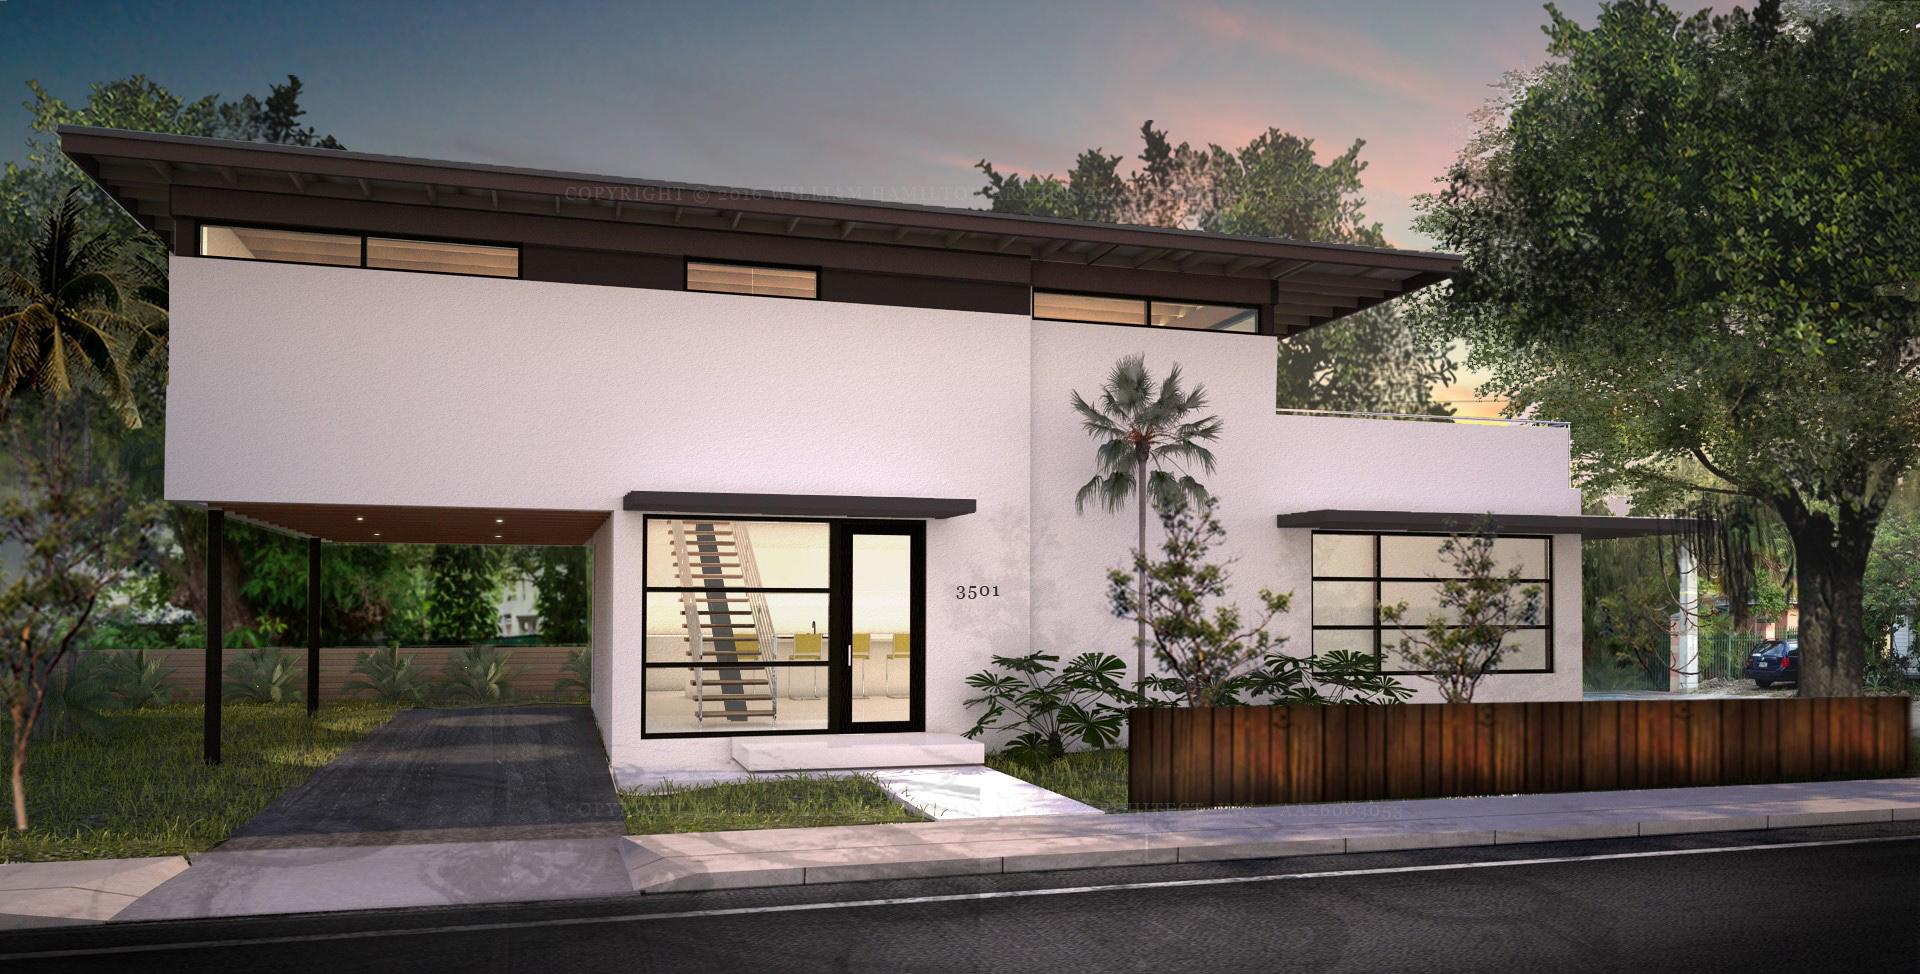 Miami's 'Glass House Project' launches in oconut Grove - urbed Miami - ^